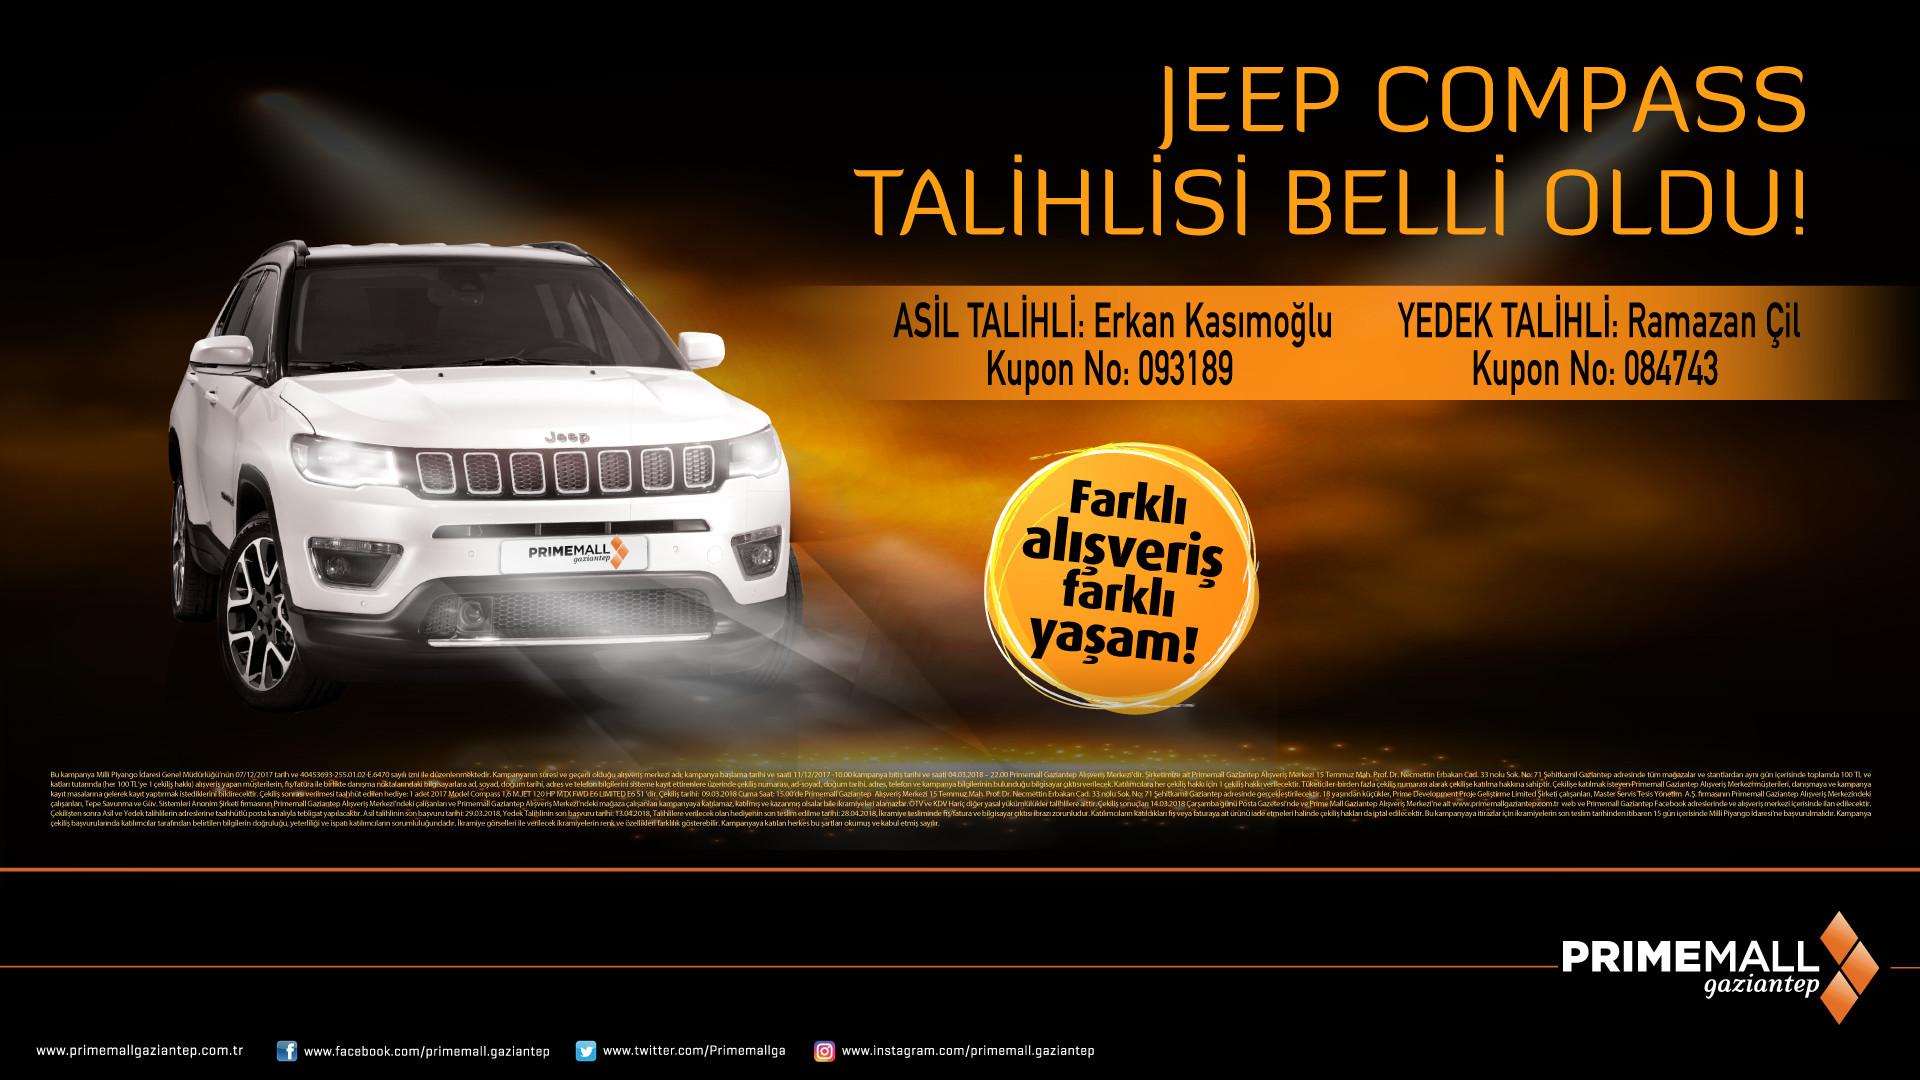 Jeep Compass Talihlisi Belli Oldu!